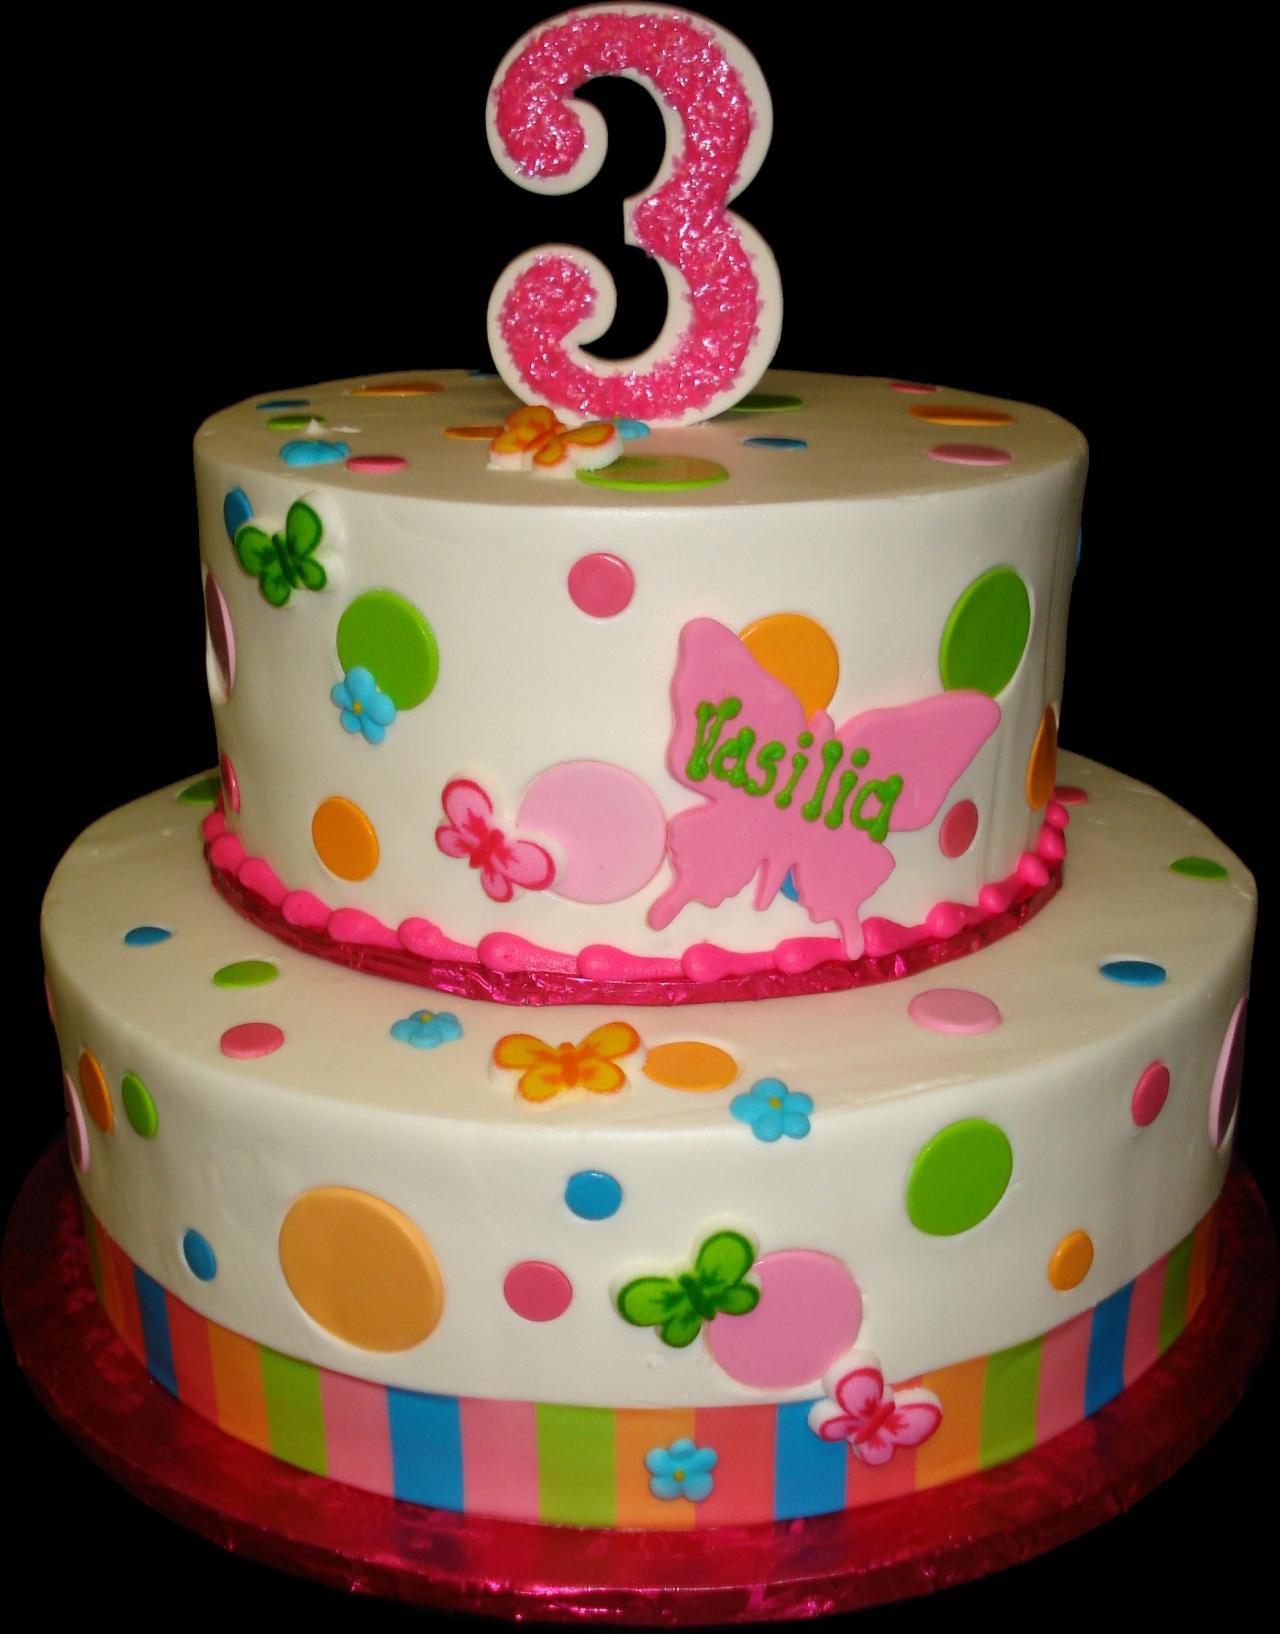 Pleasing Birthday Cakes Sugar Showcase Birthday Cards Printable Trancafe Filternl